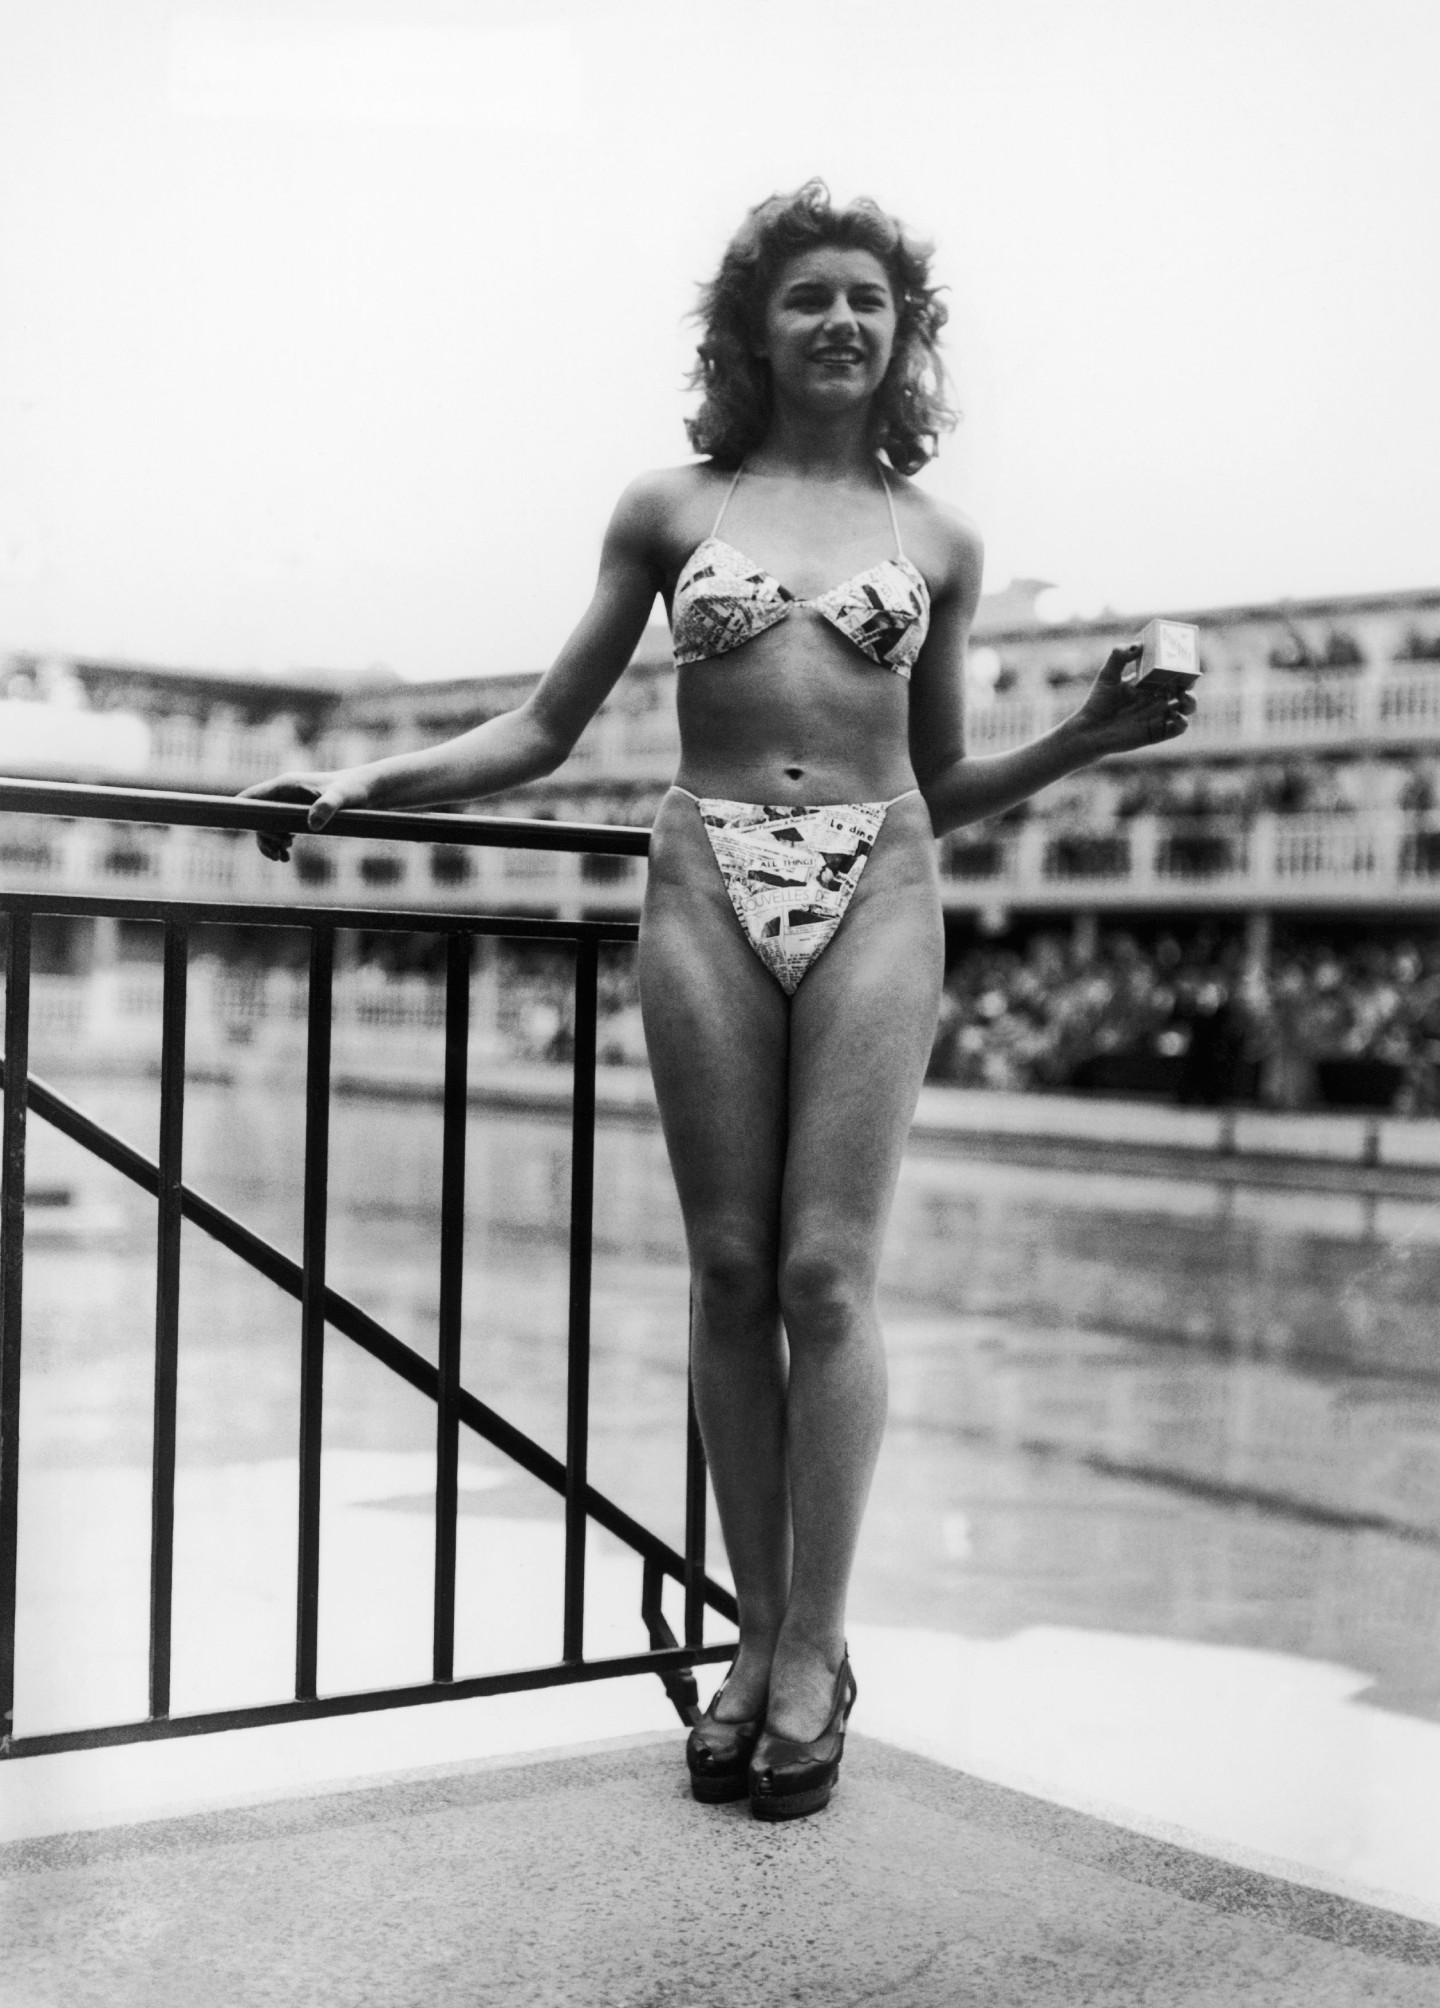 Танцовщица кабаре «Мулен Руж» на первом показе бикини, 1946 г.